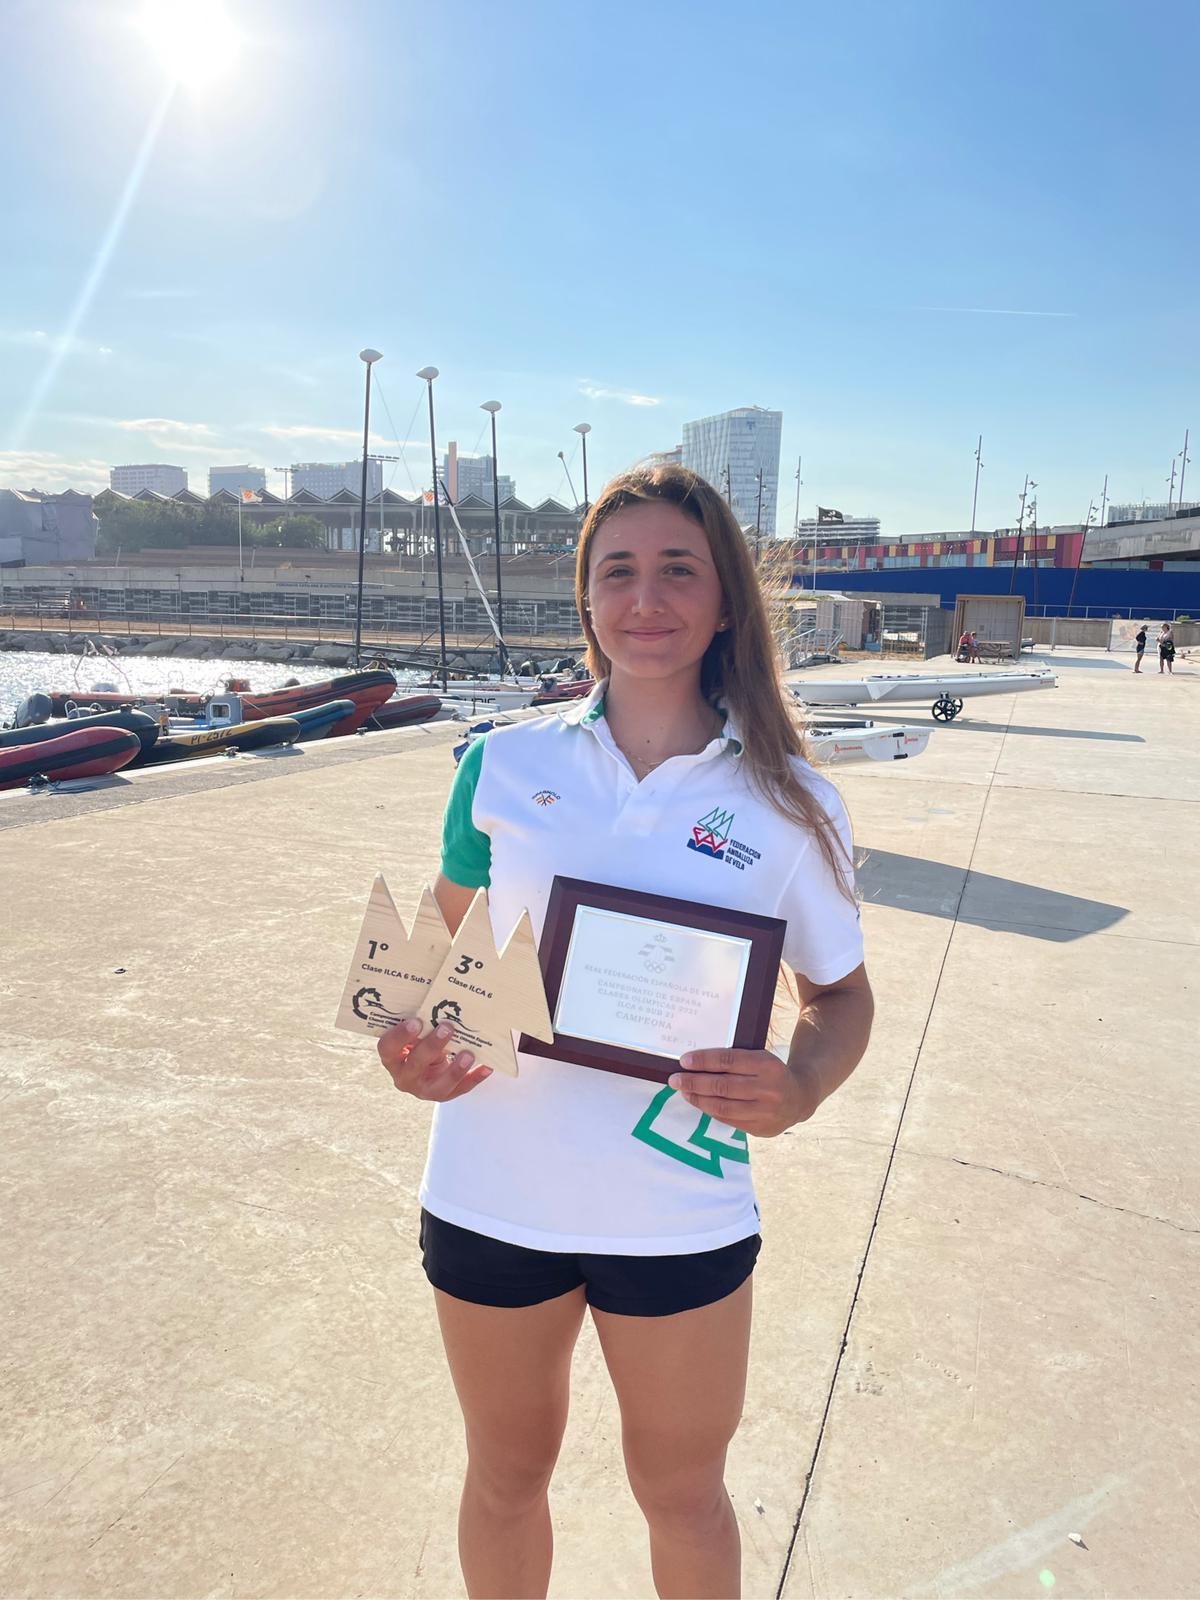 Campeonato De España De Clases Olímpicas